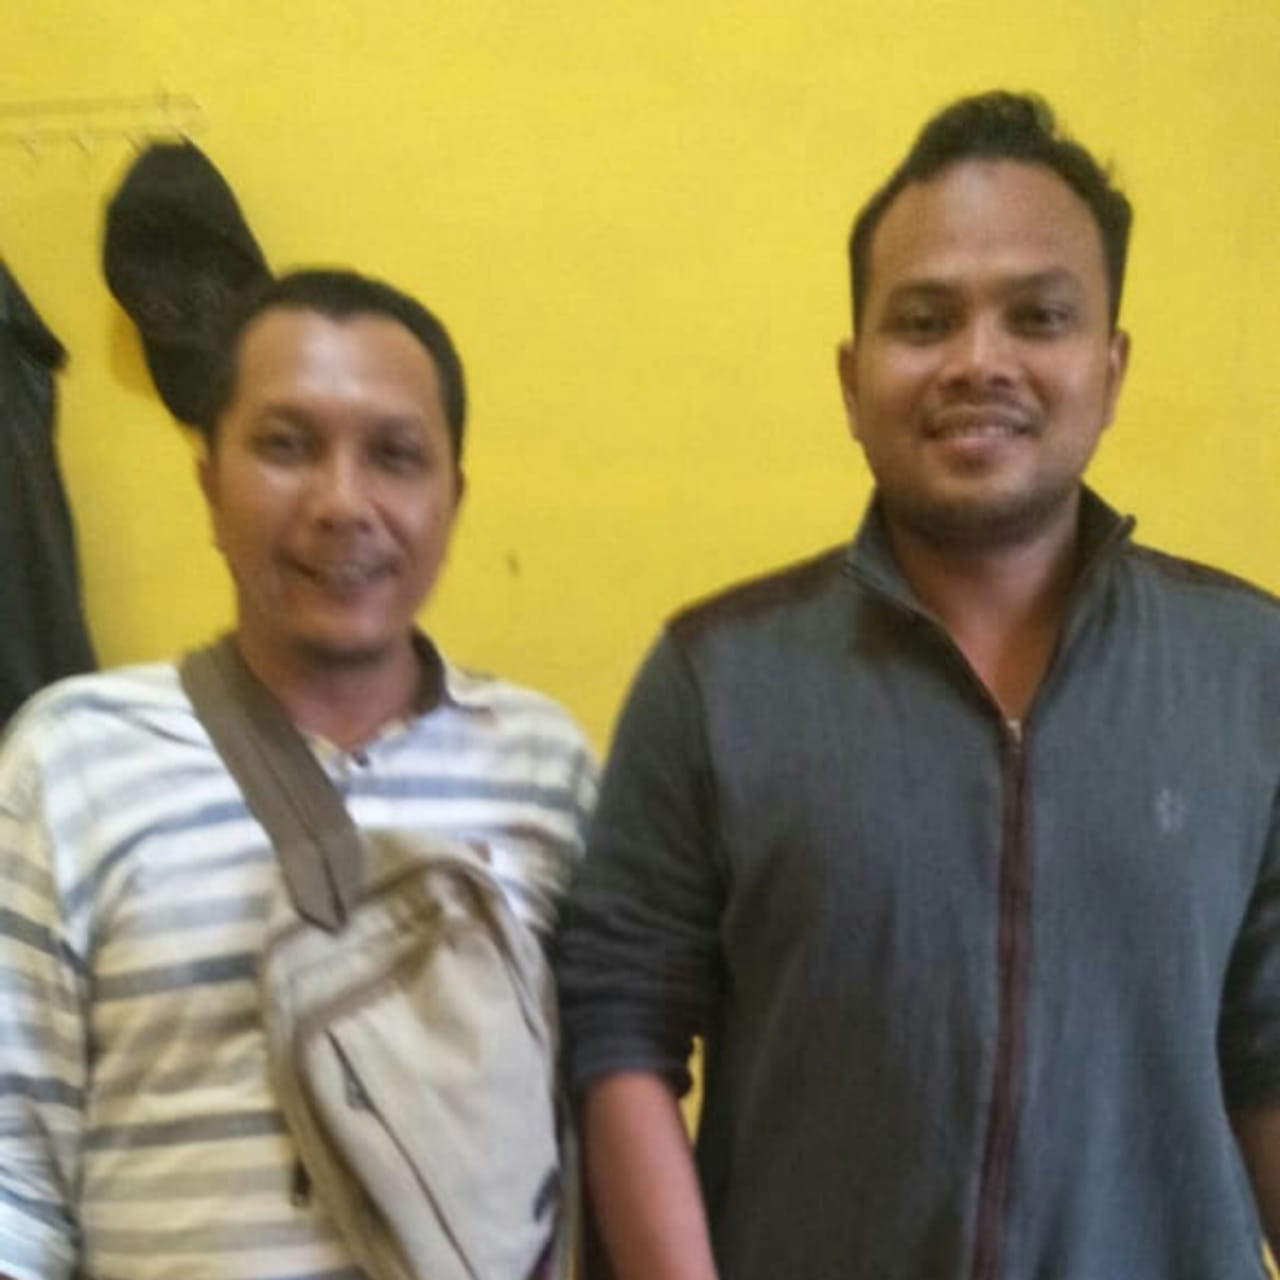 Dewan Pengawas LBH Mahatva Ucapkan Terimakasih ke Polsek Bagan Sinembah